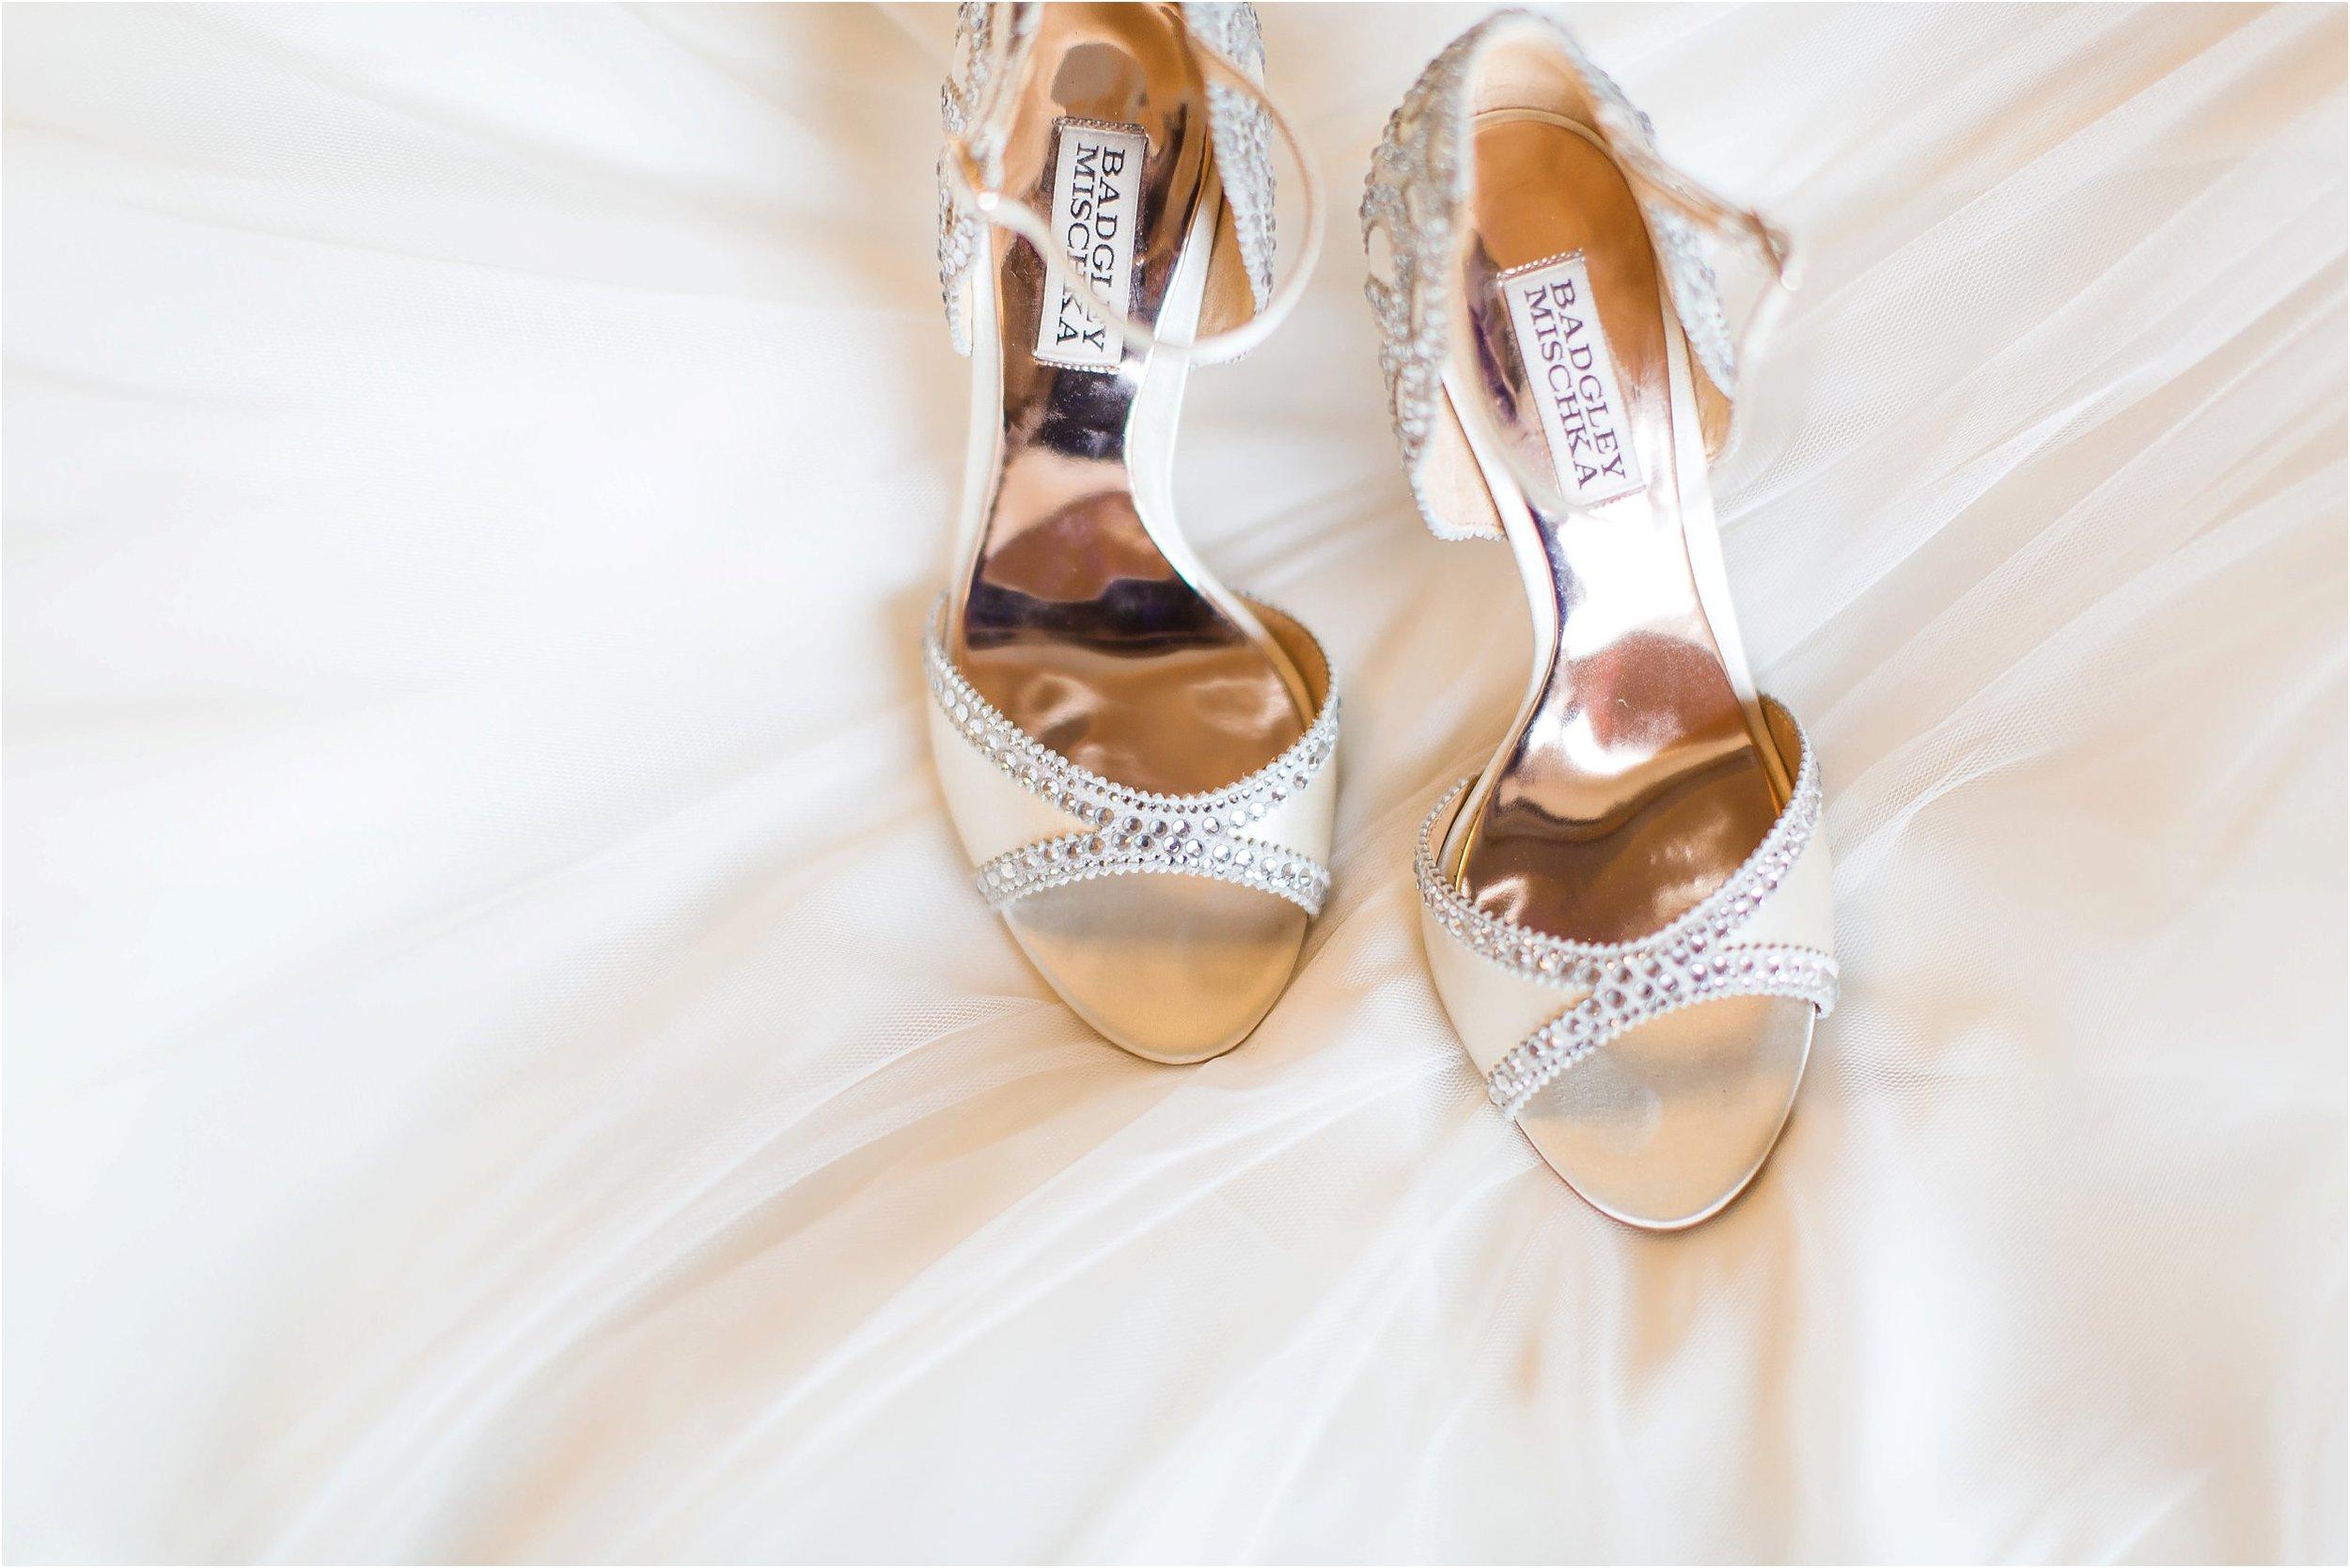 Badgley Mischka embellished bridal shoes